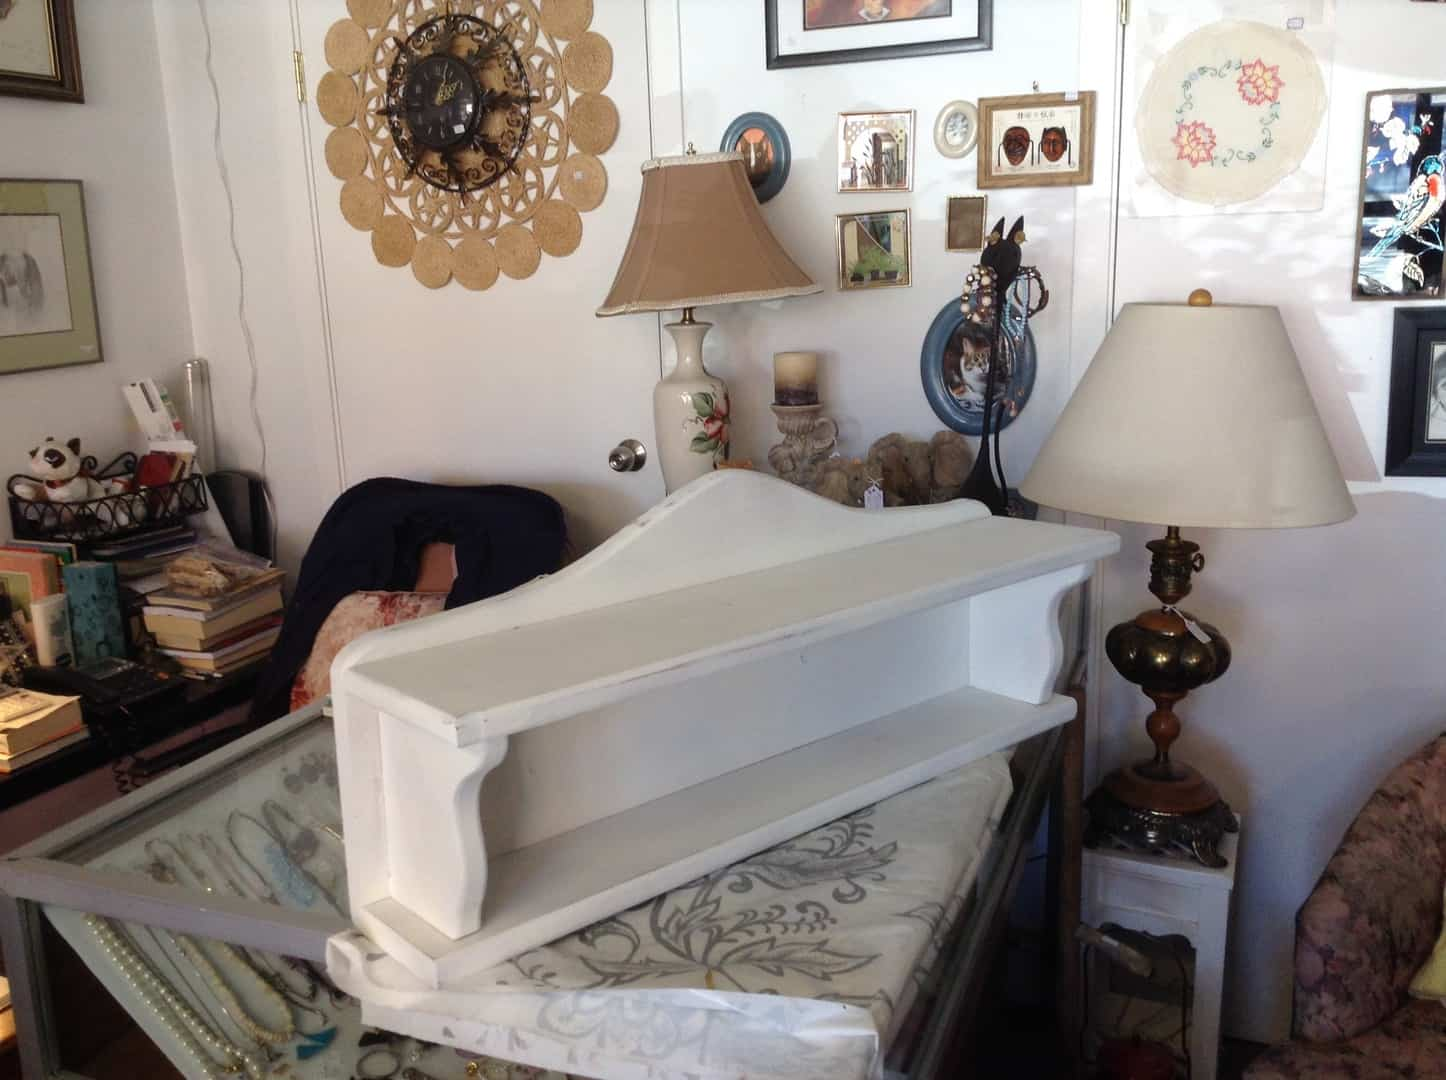 Merritt, B.B., seniors repurposing furniture